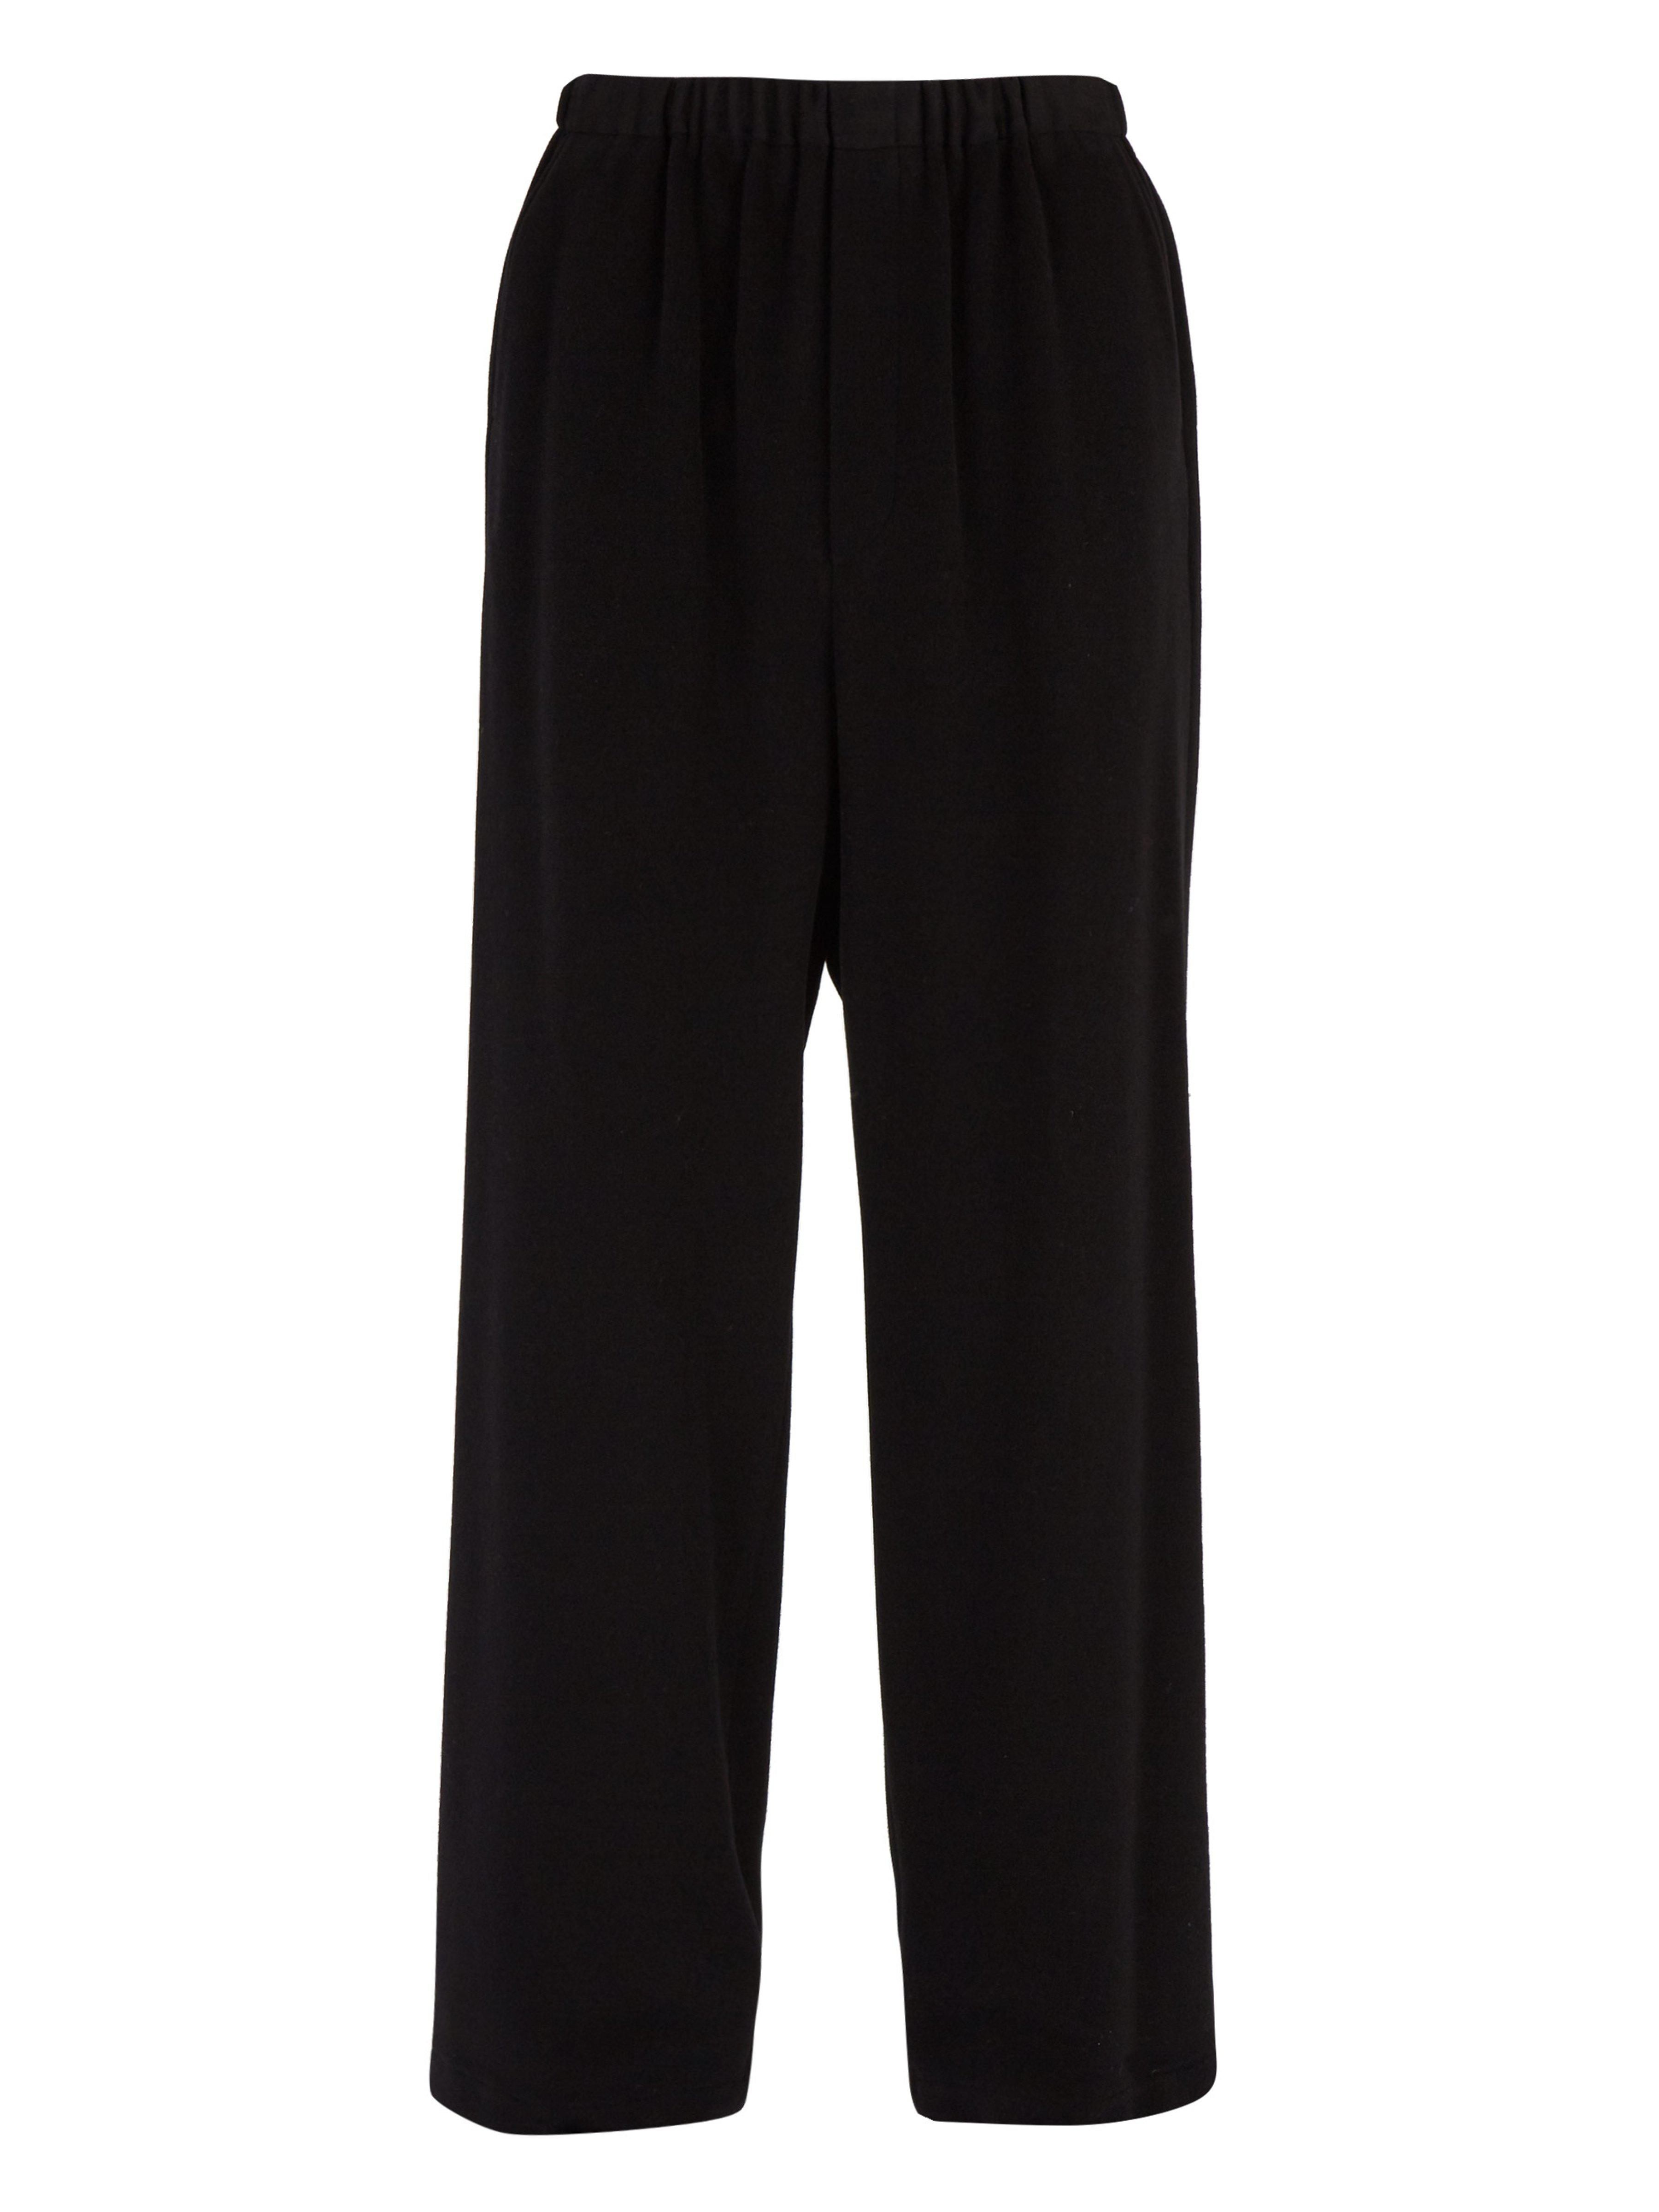 95b4fc379e1868 Balenciaga Wool Blend Fleece Track Pants in Black for Men - Lyst